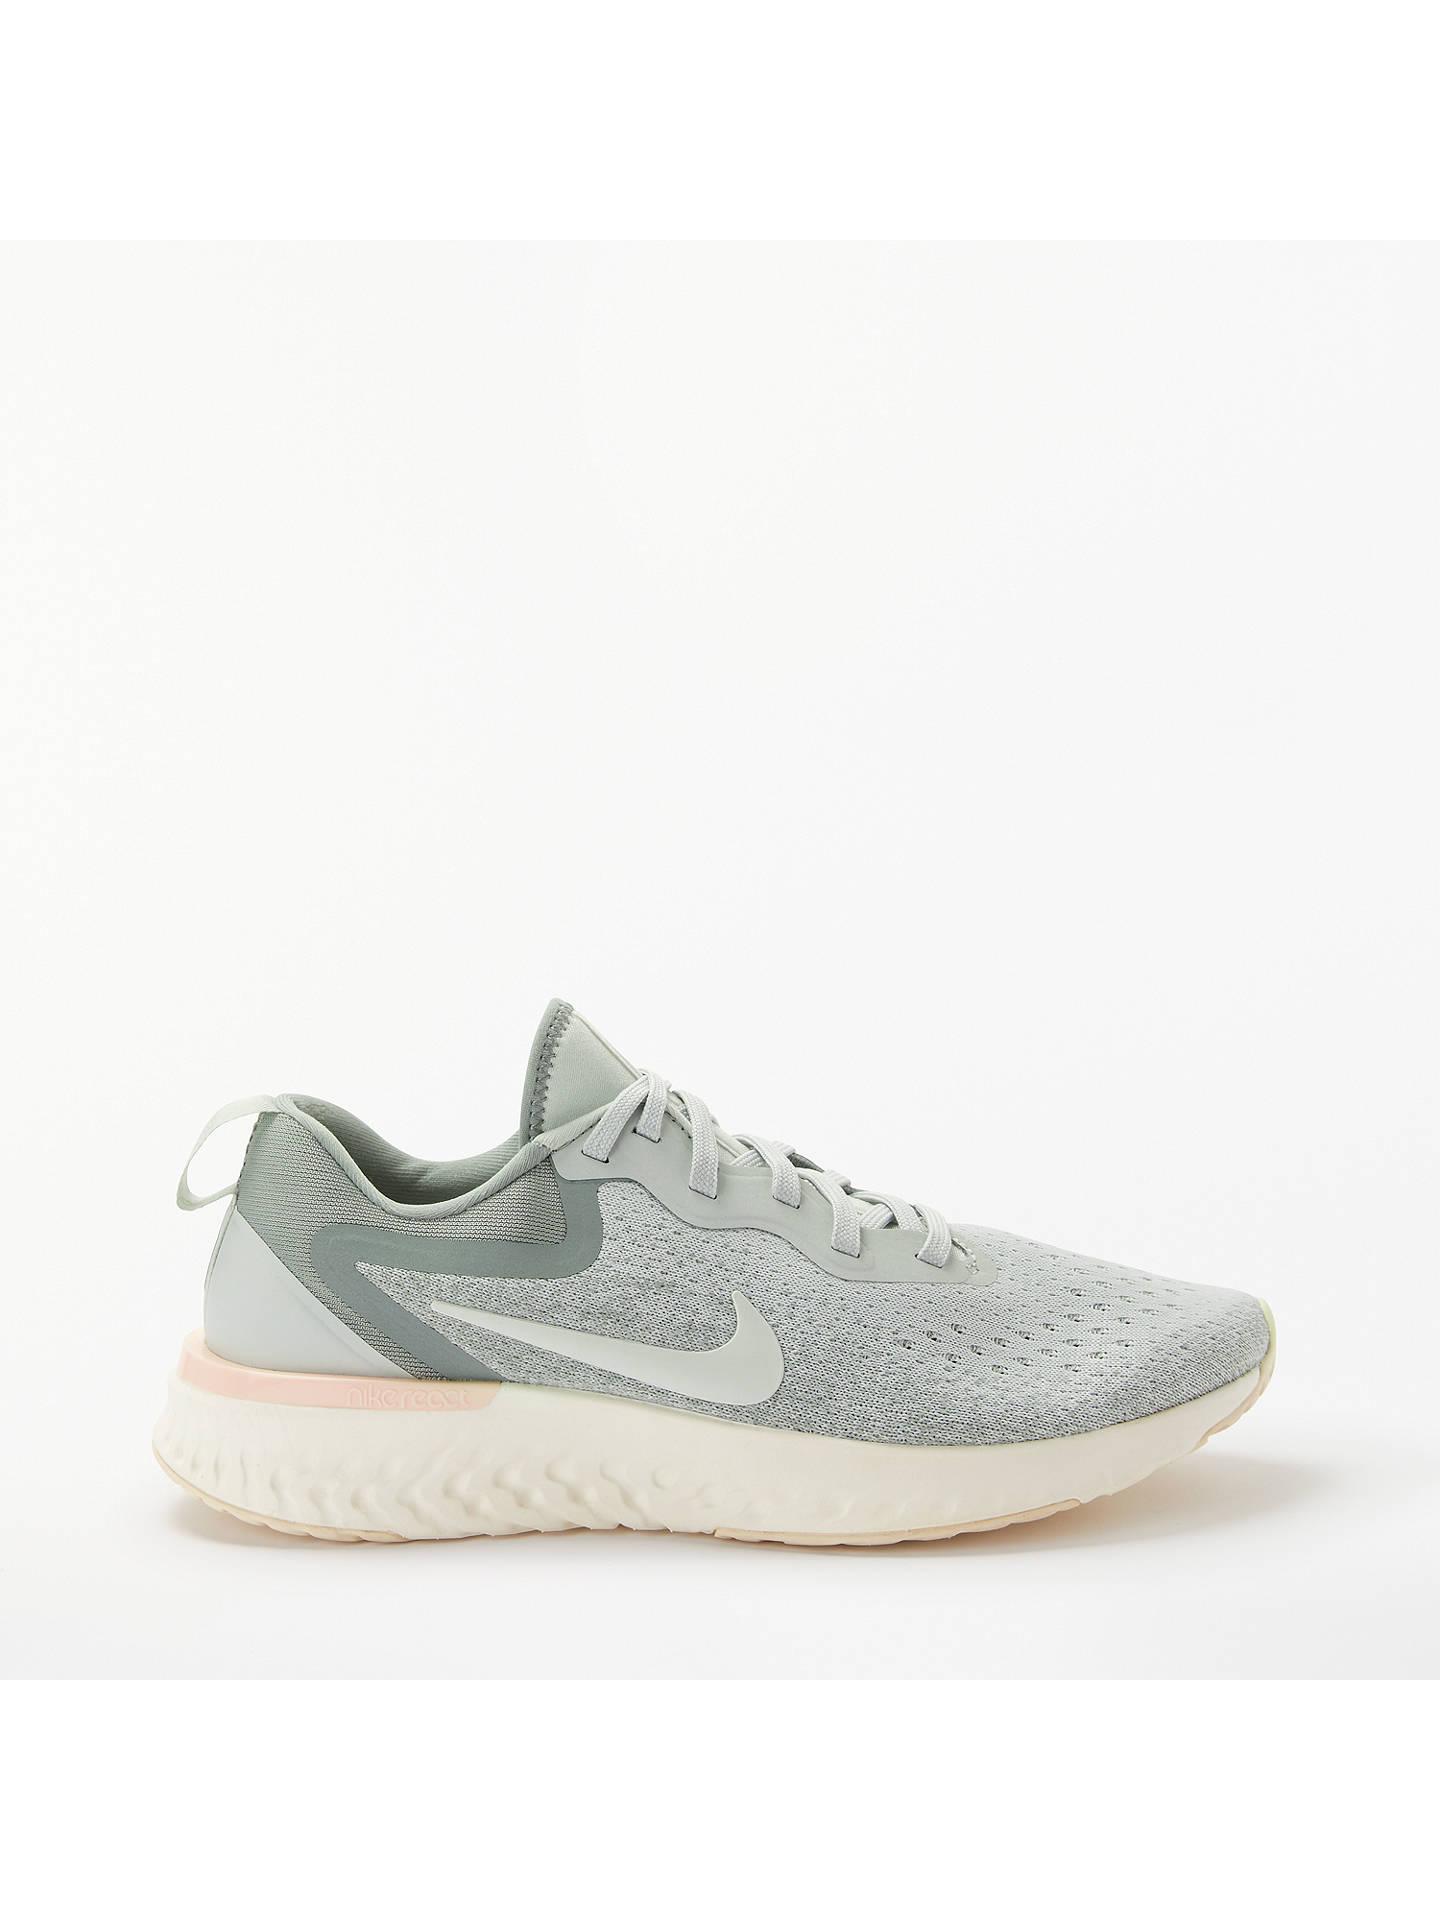 27af180b817d1 Buy Nike Odyssey React Women s Running Shoe